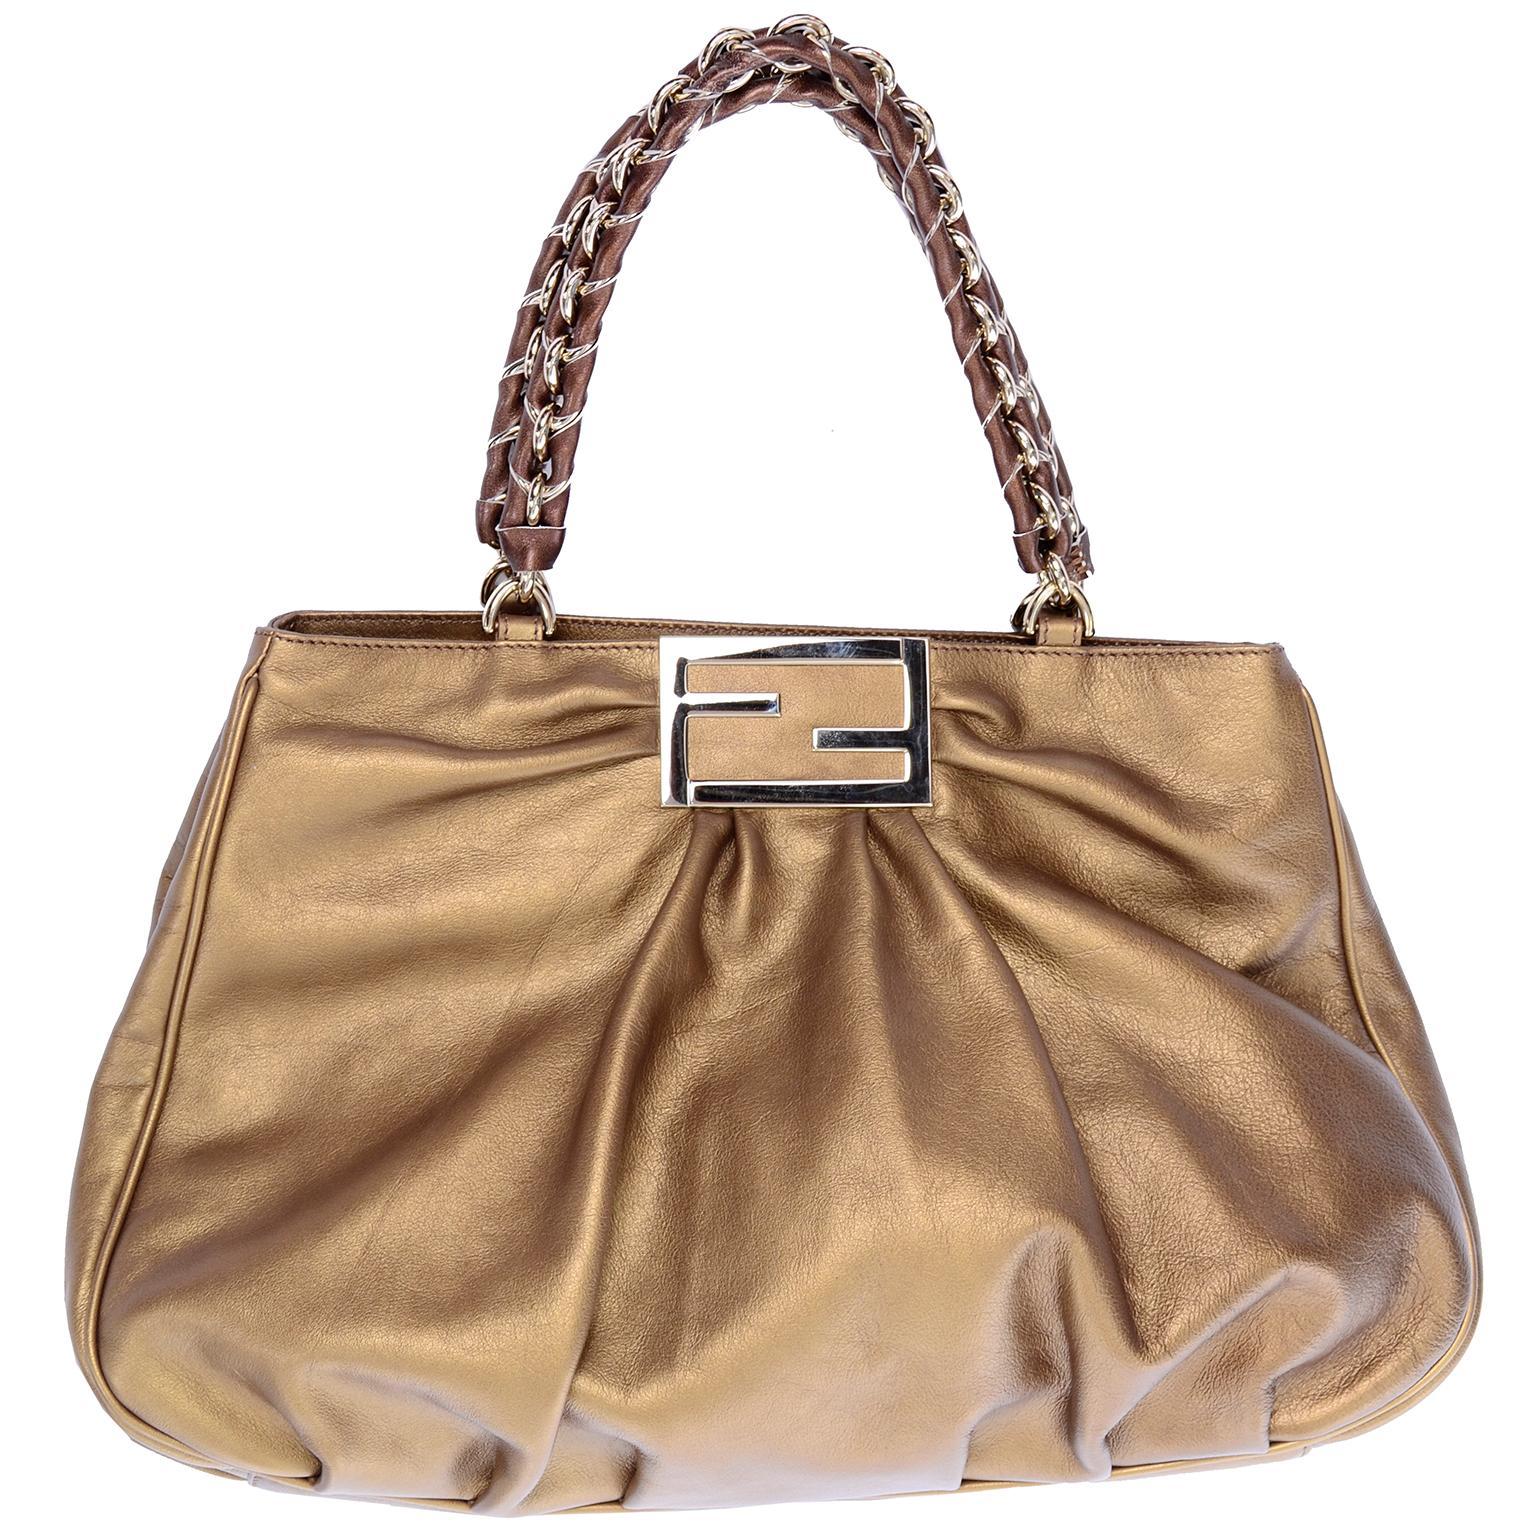 Fendi Bag in Bronze Leather Borsa Mia Handbag w/ Shoulder Strap & Original Card